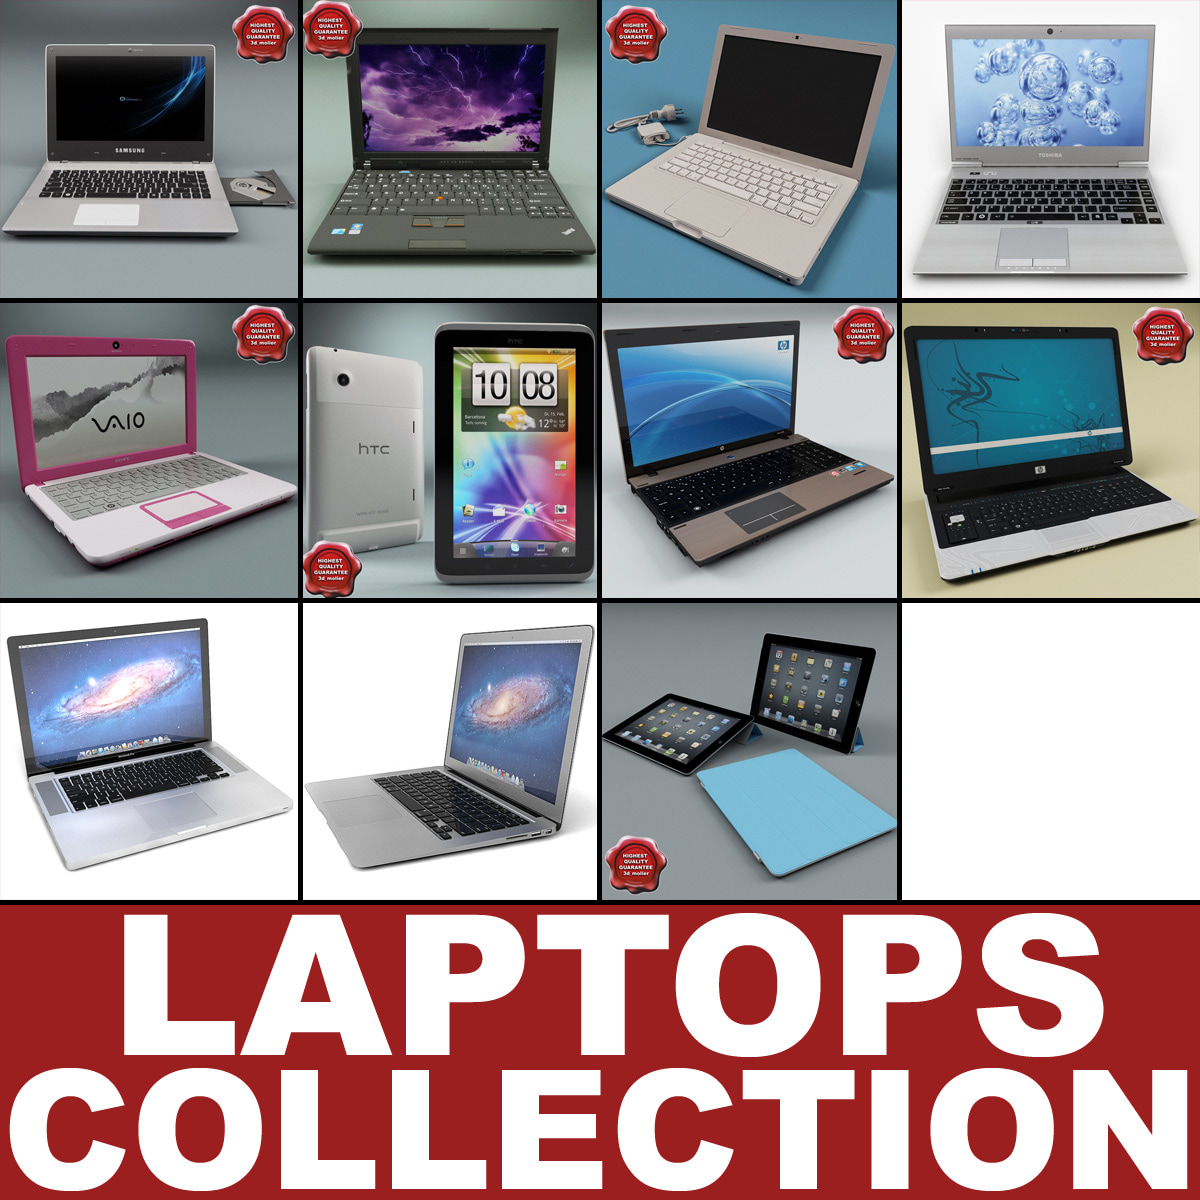 Laptops_Collection_V6_000.jpg